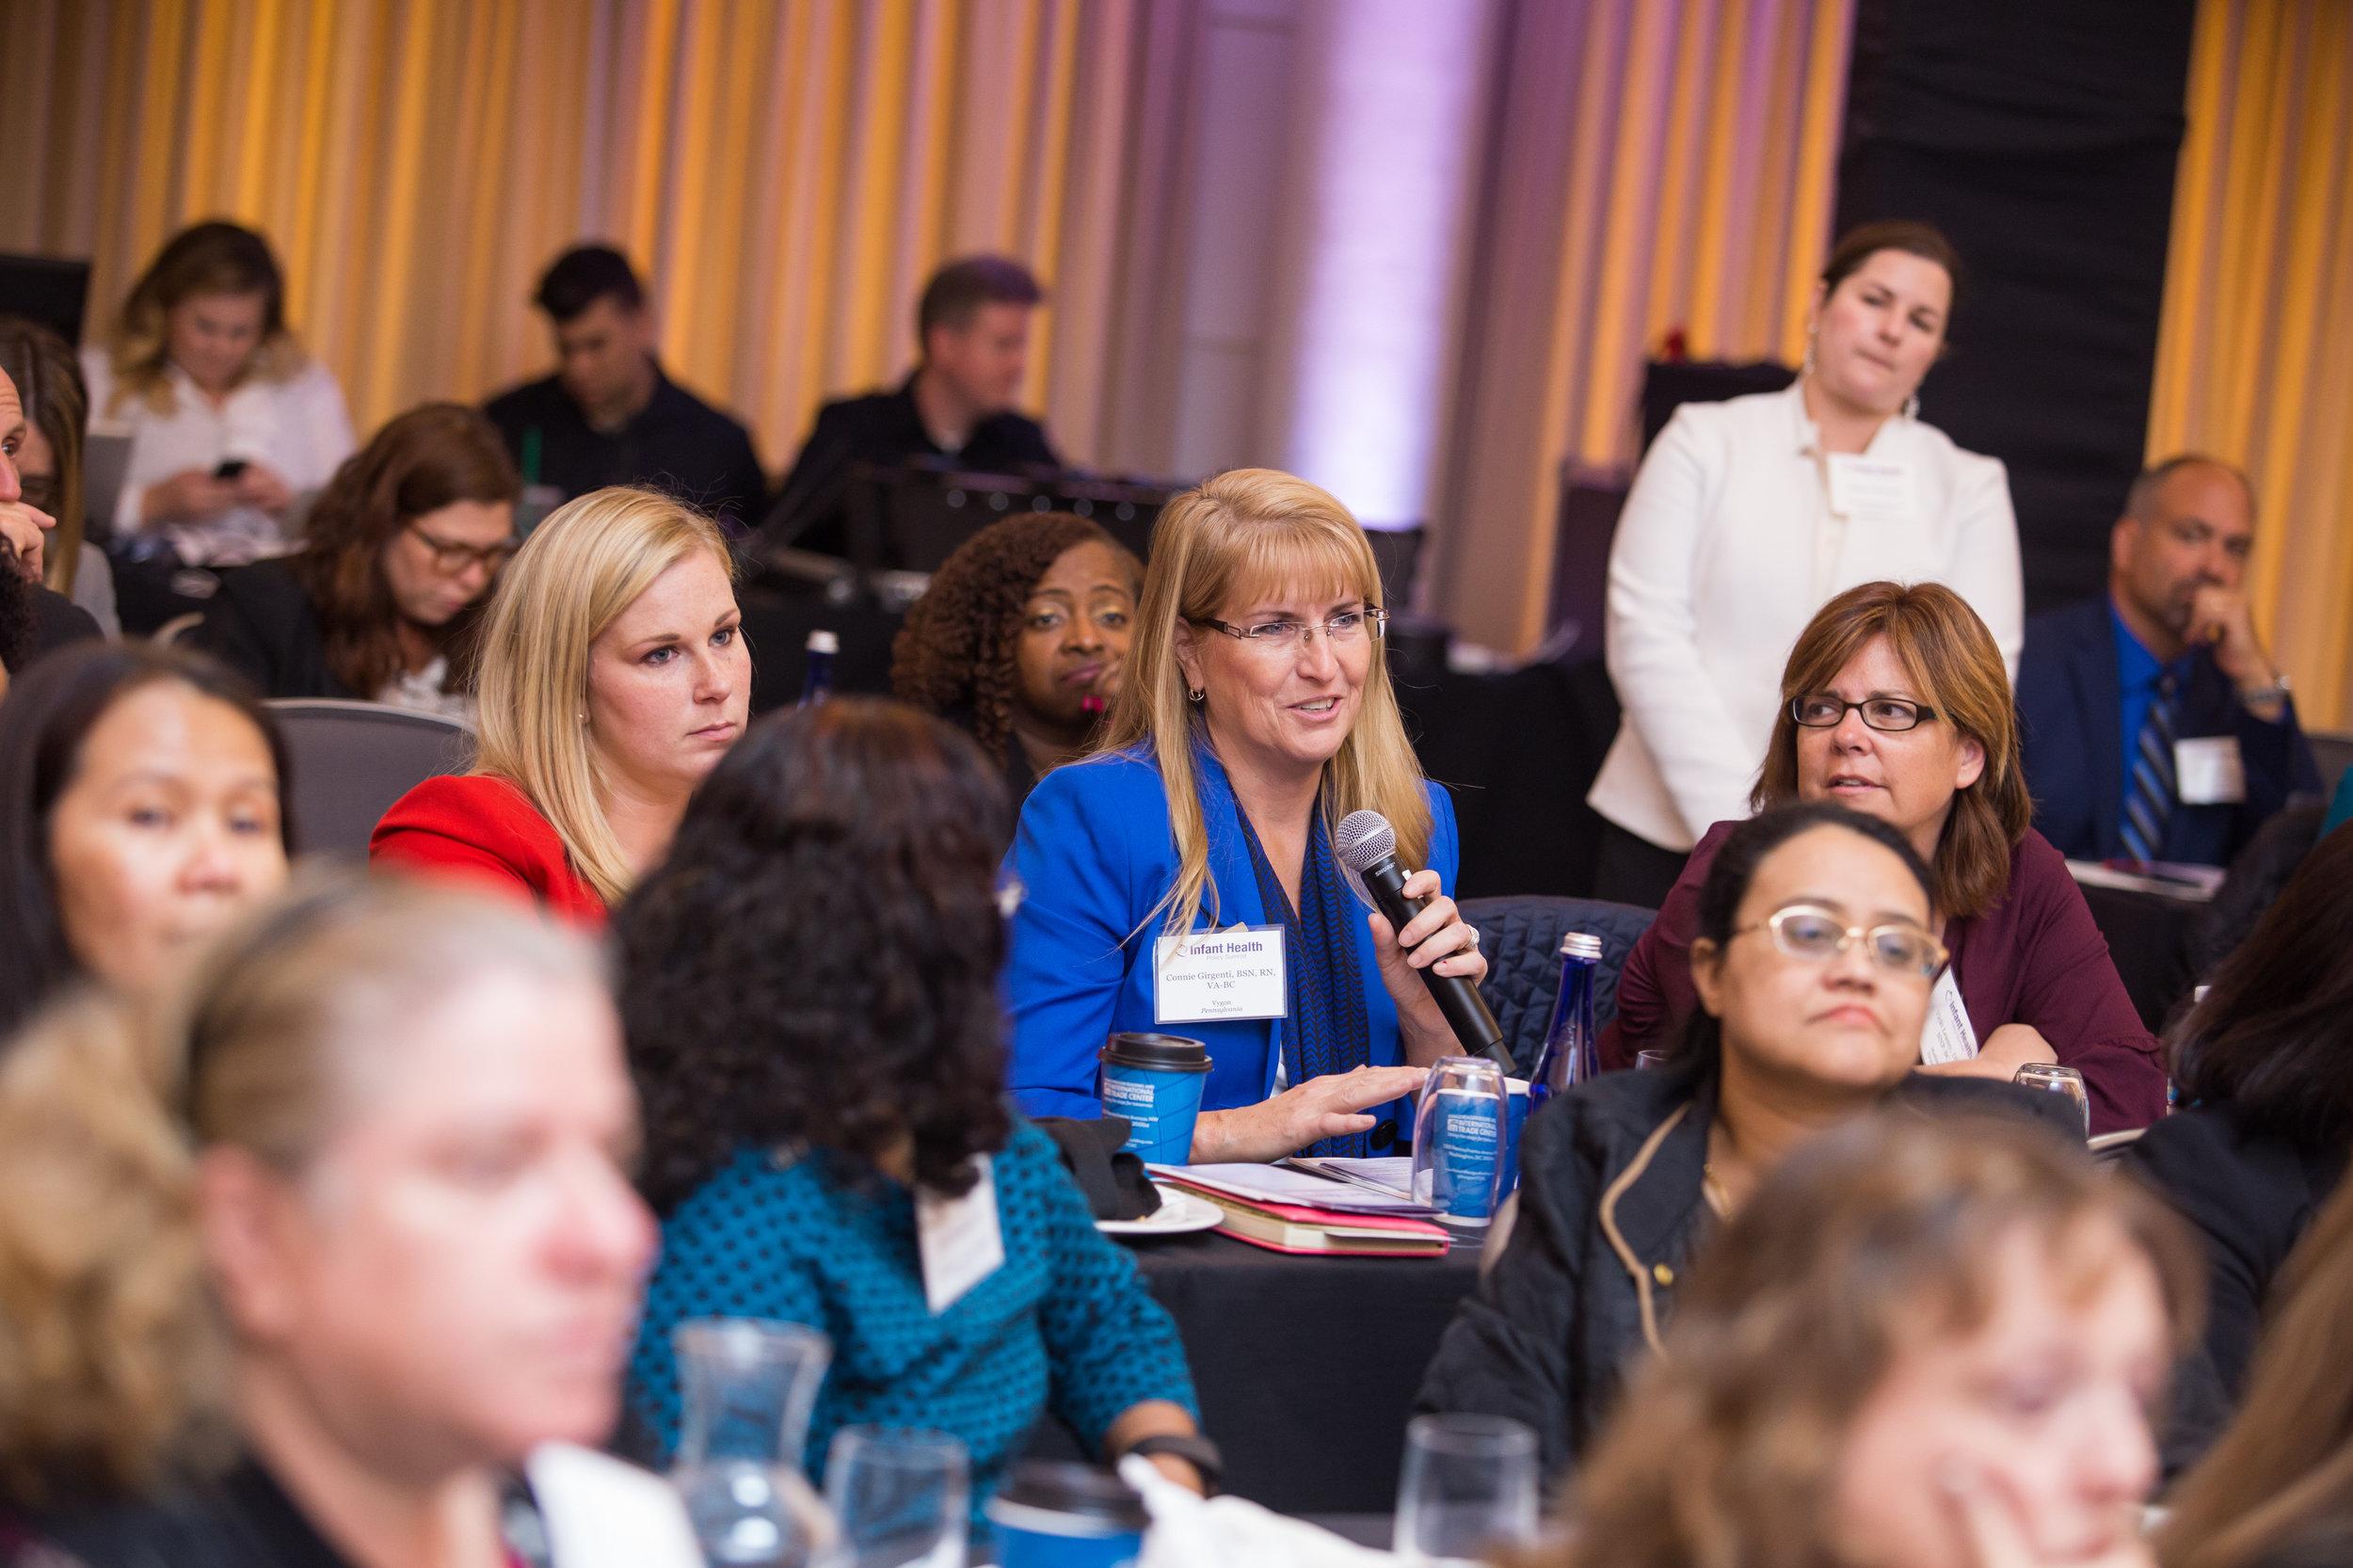 Infant Health Policy Summit - Jason Dixson Photography - 123046 - 2073.jpg